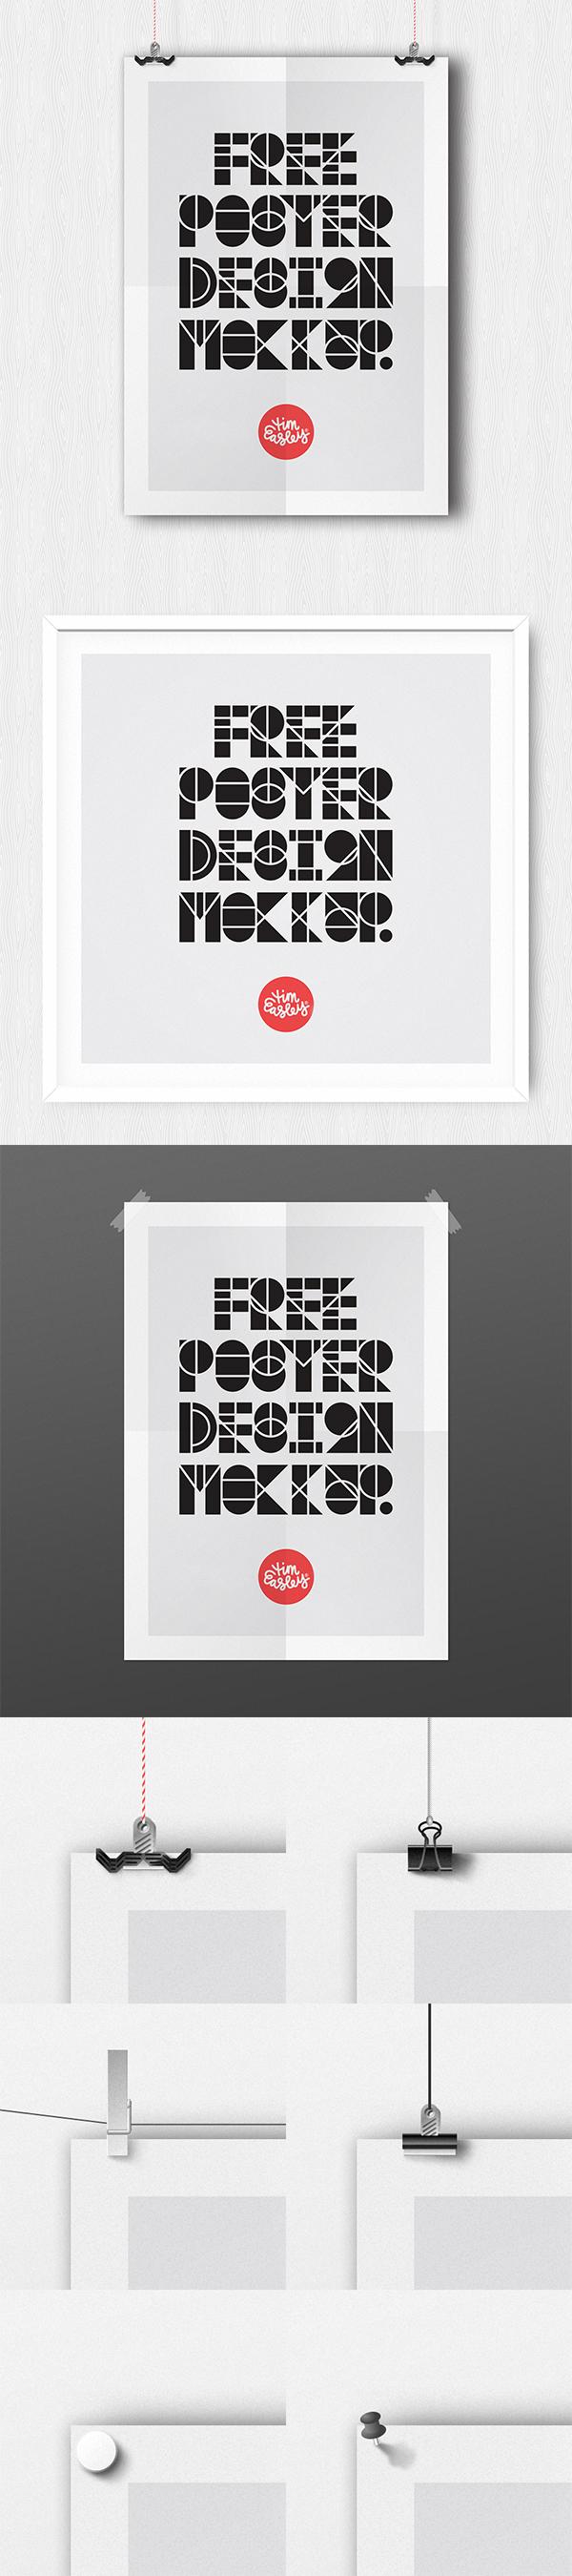 18 Free Poster Design Mockup